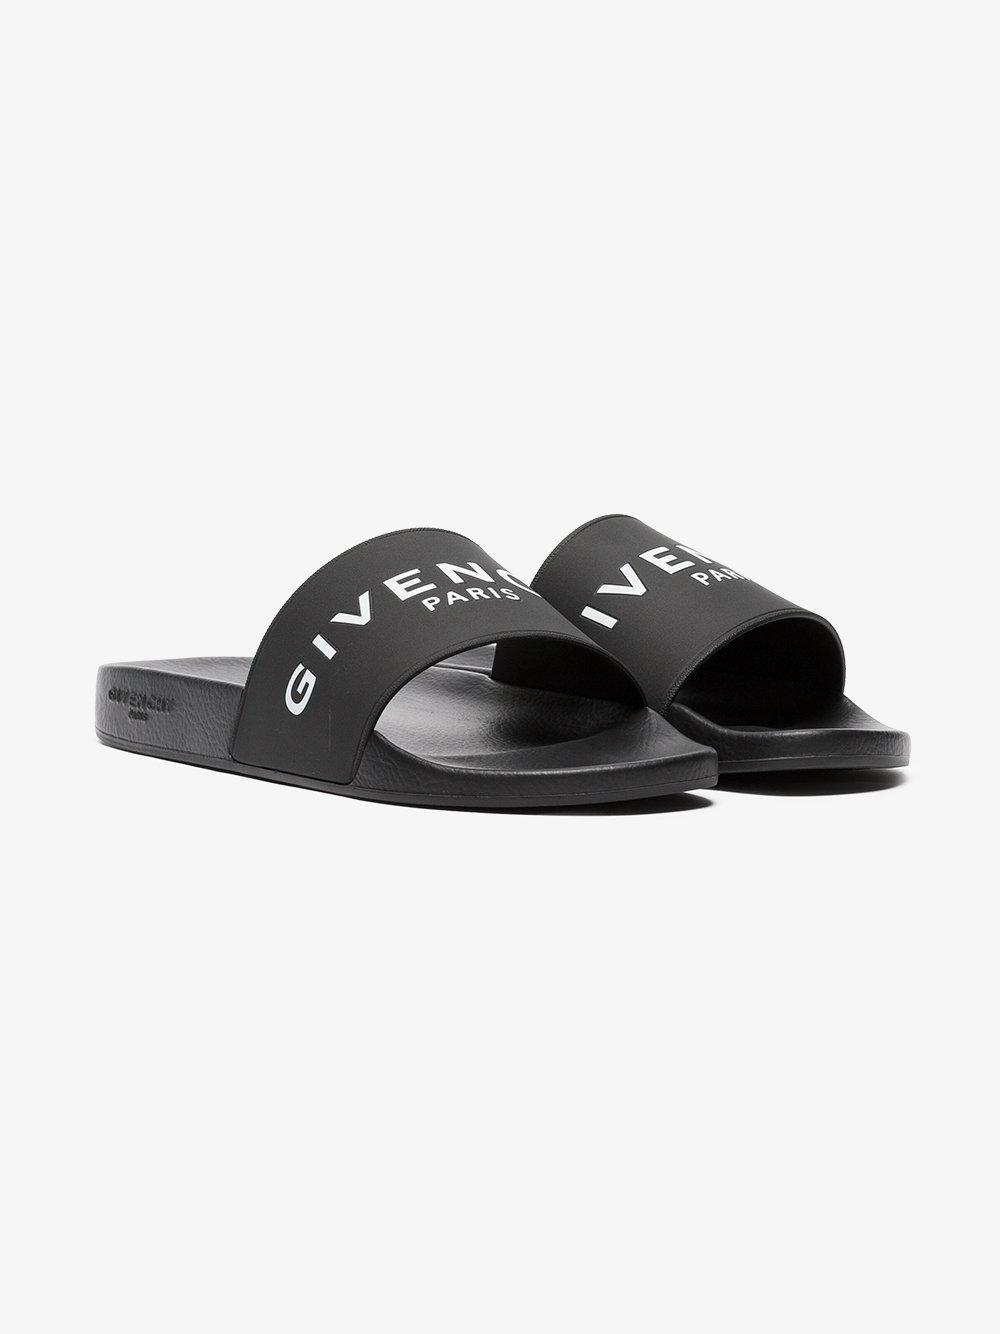 d44f7bae54c7 Givenchy Black And White Paris Logo Rubber Slides in Black for Men ...